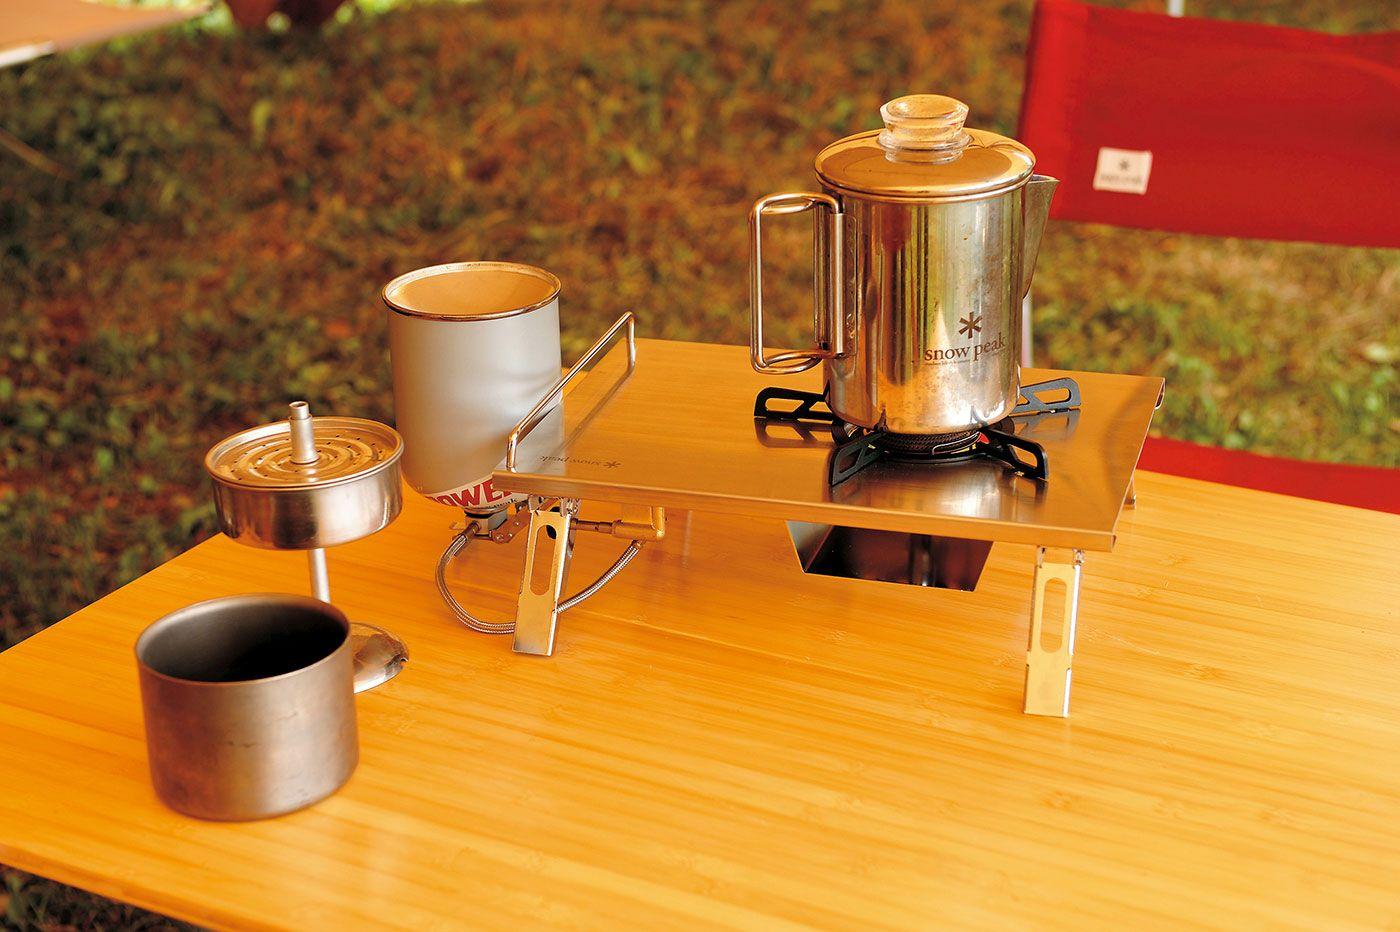 Stainless Coffee Percolator – Snow Peak...drrroooollllzzz